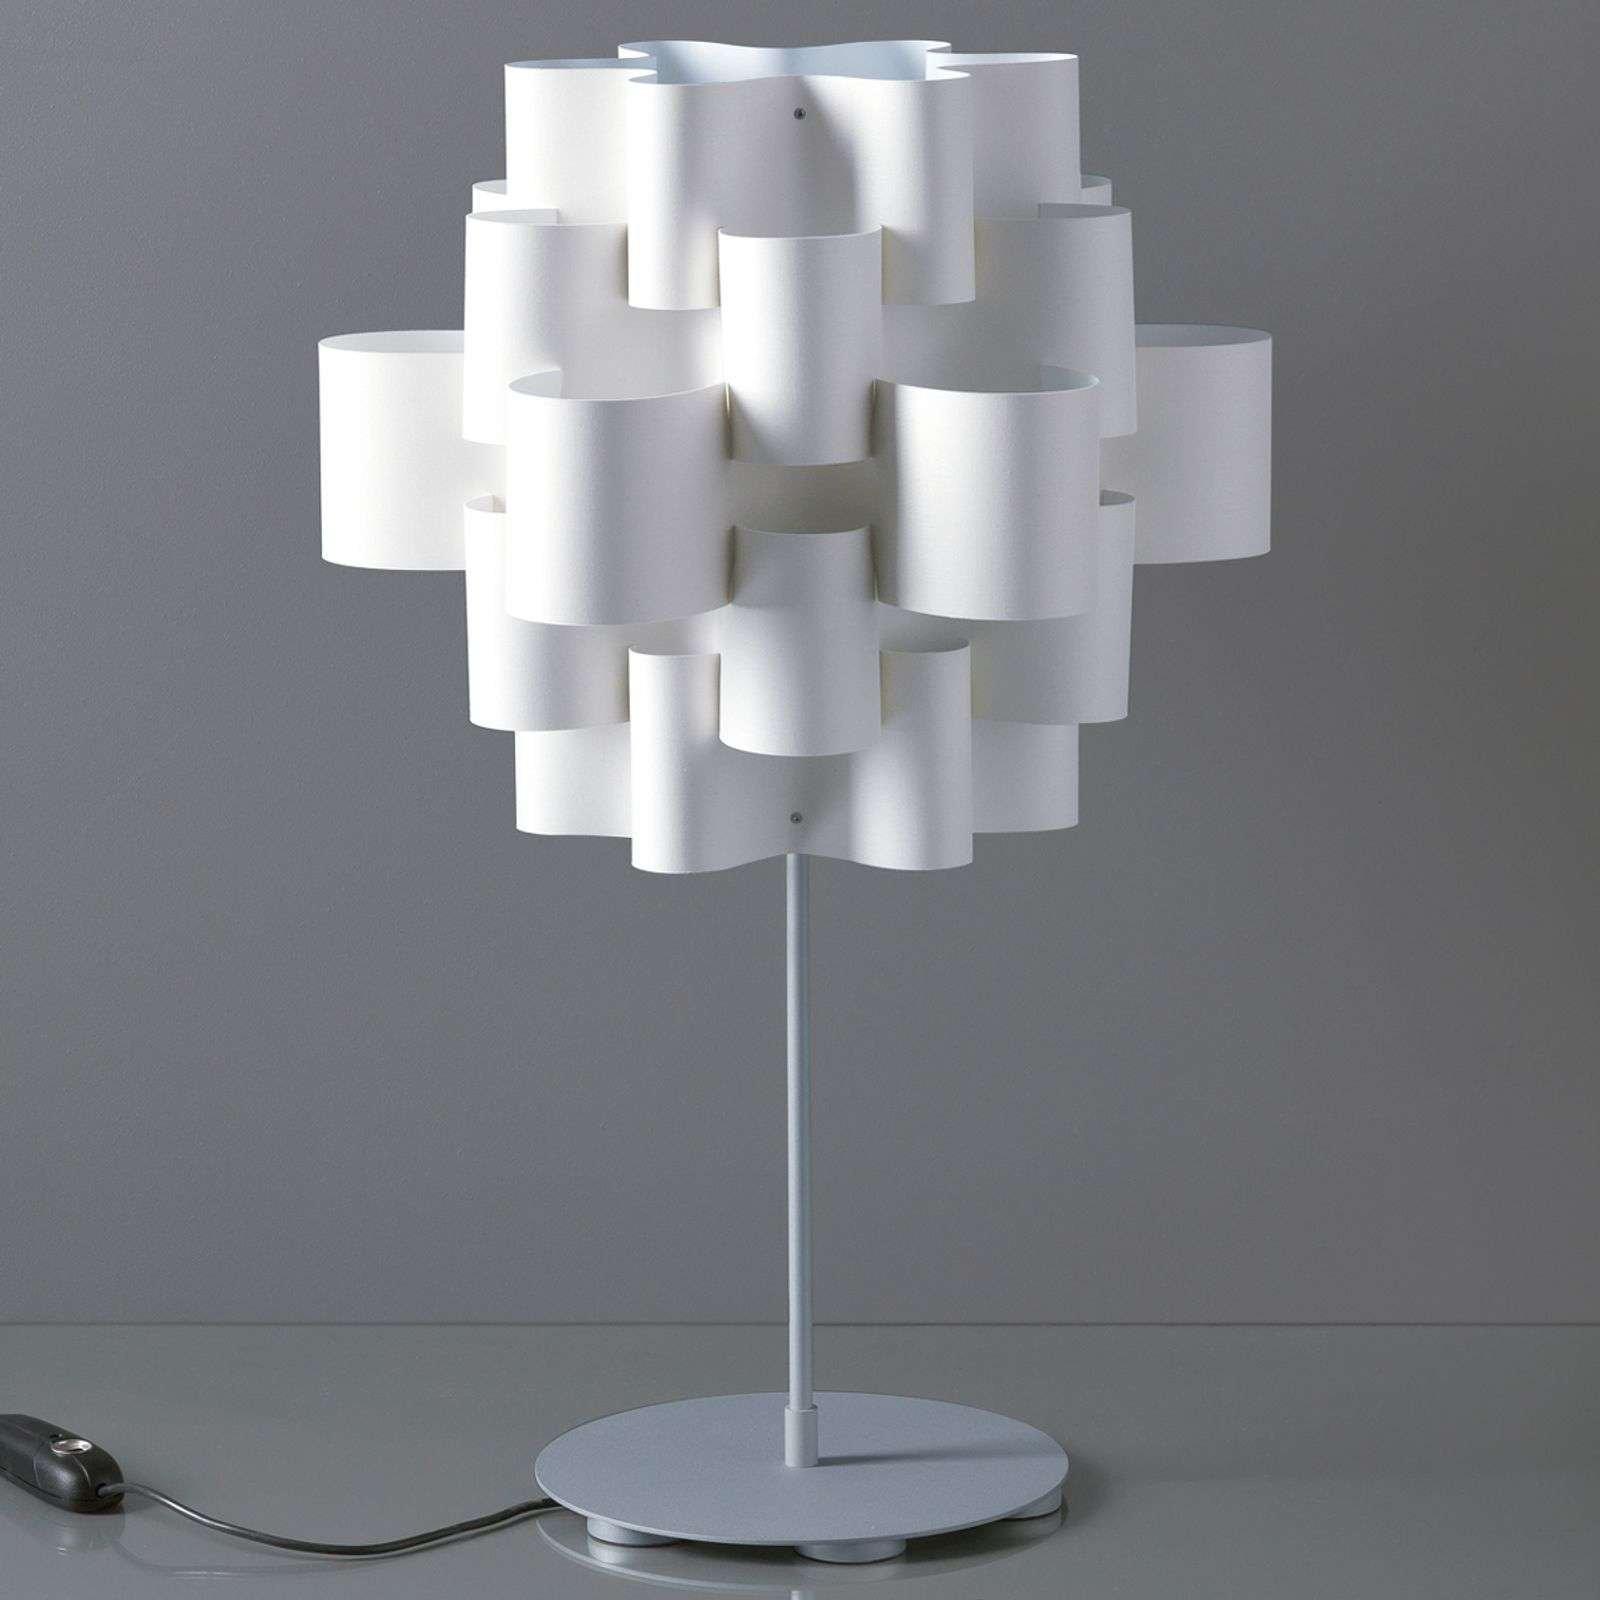 Exceptional designer table lamp Sun in white